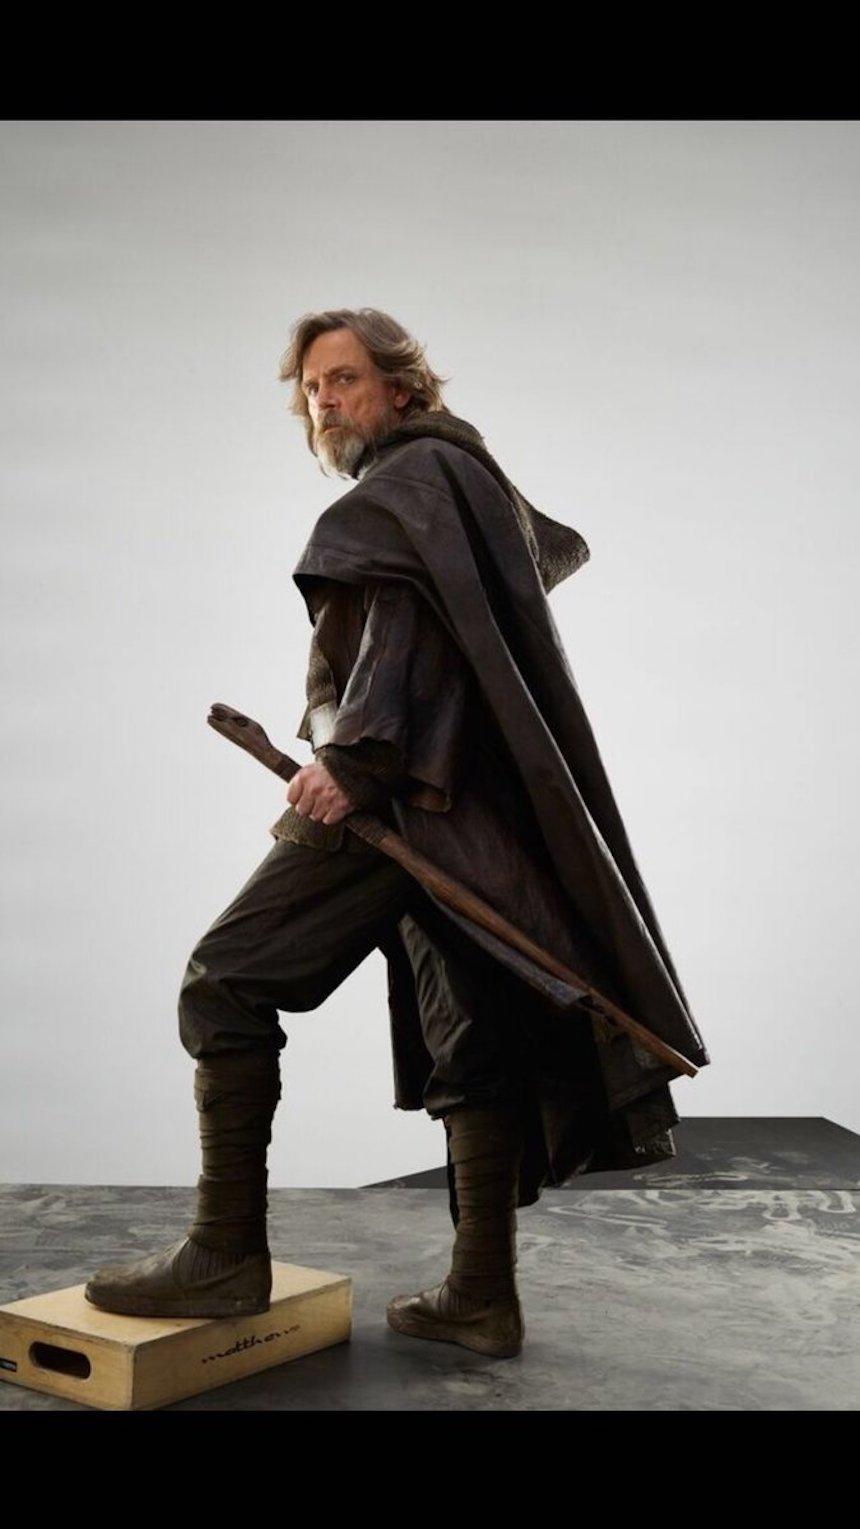 Star Wars: The Last Jedi - Luke